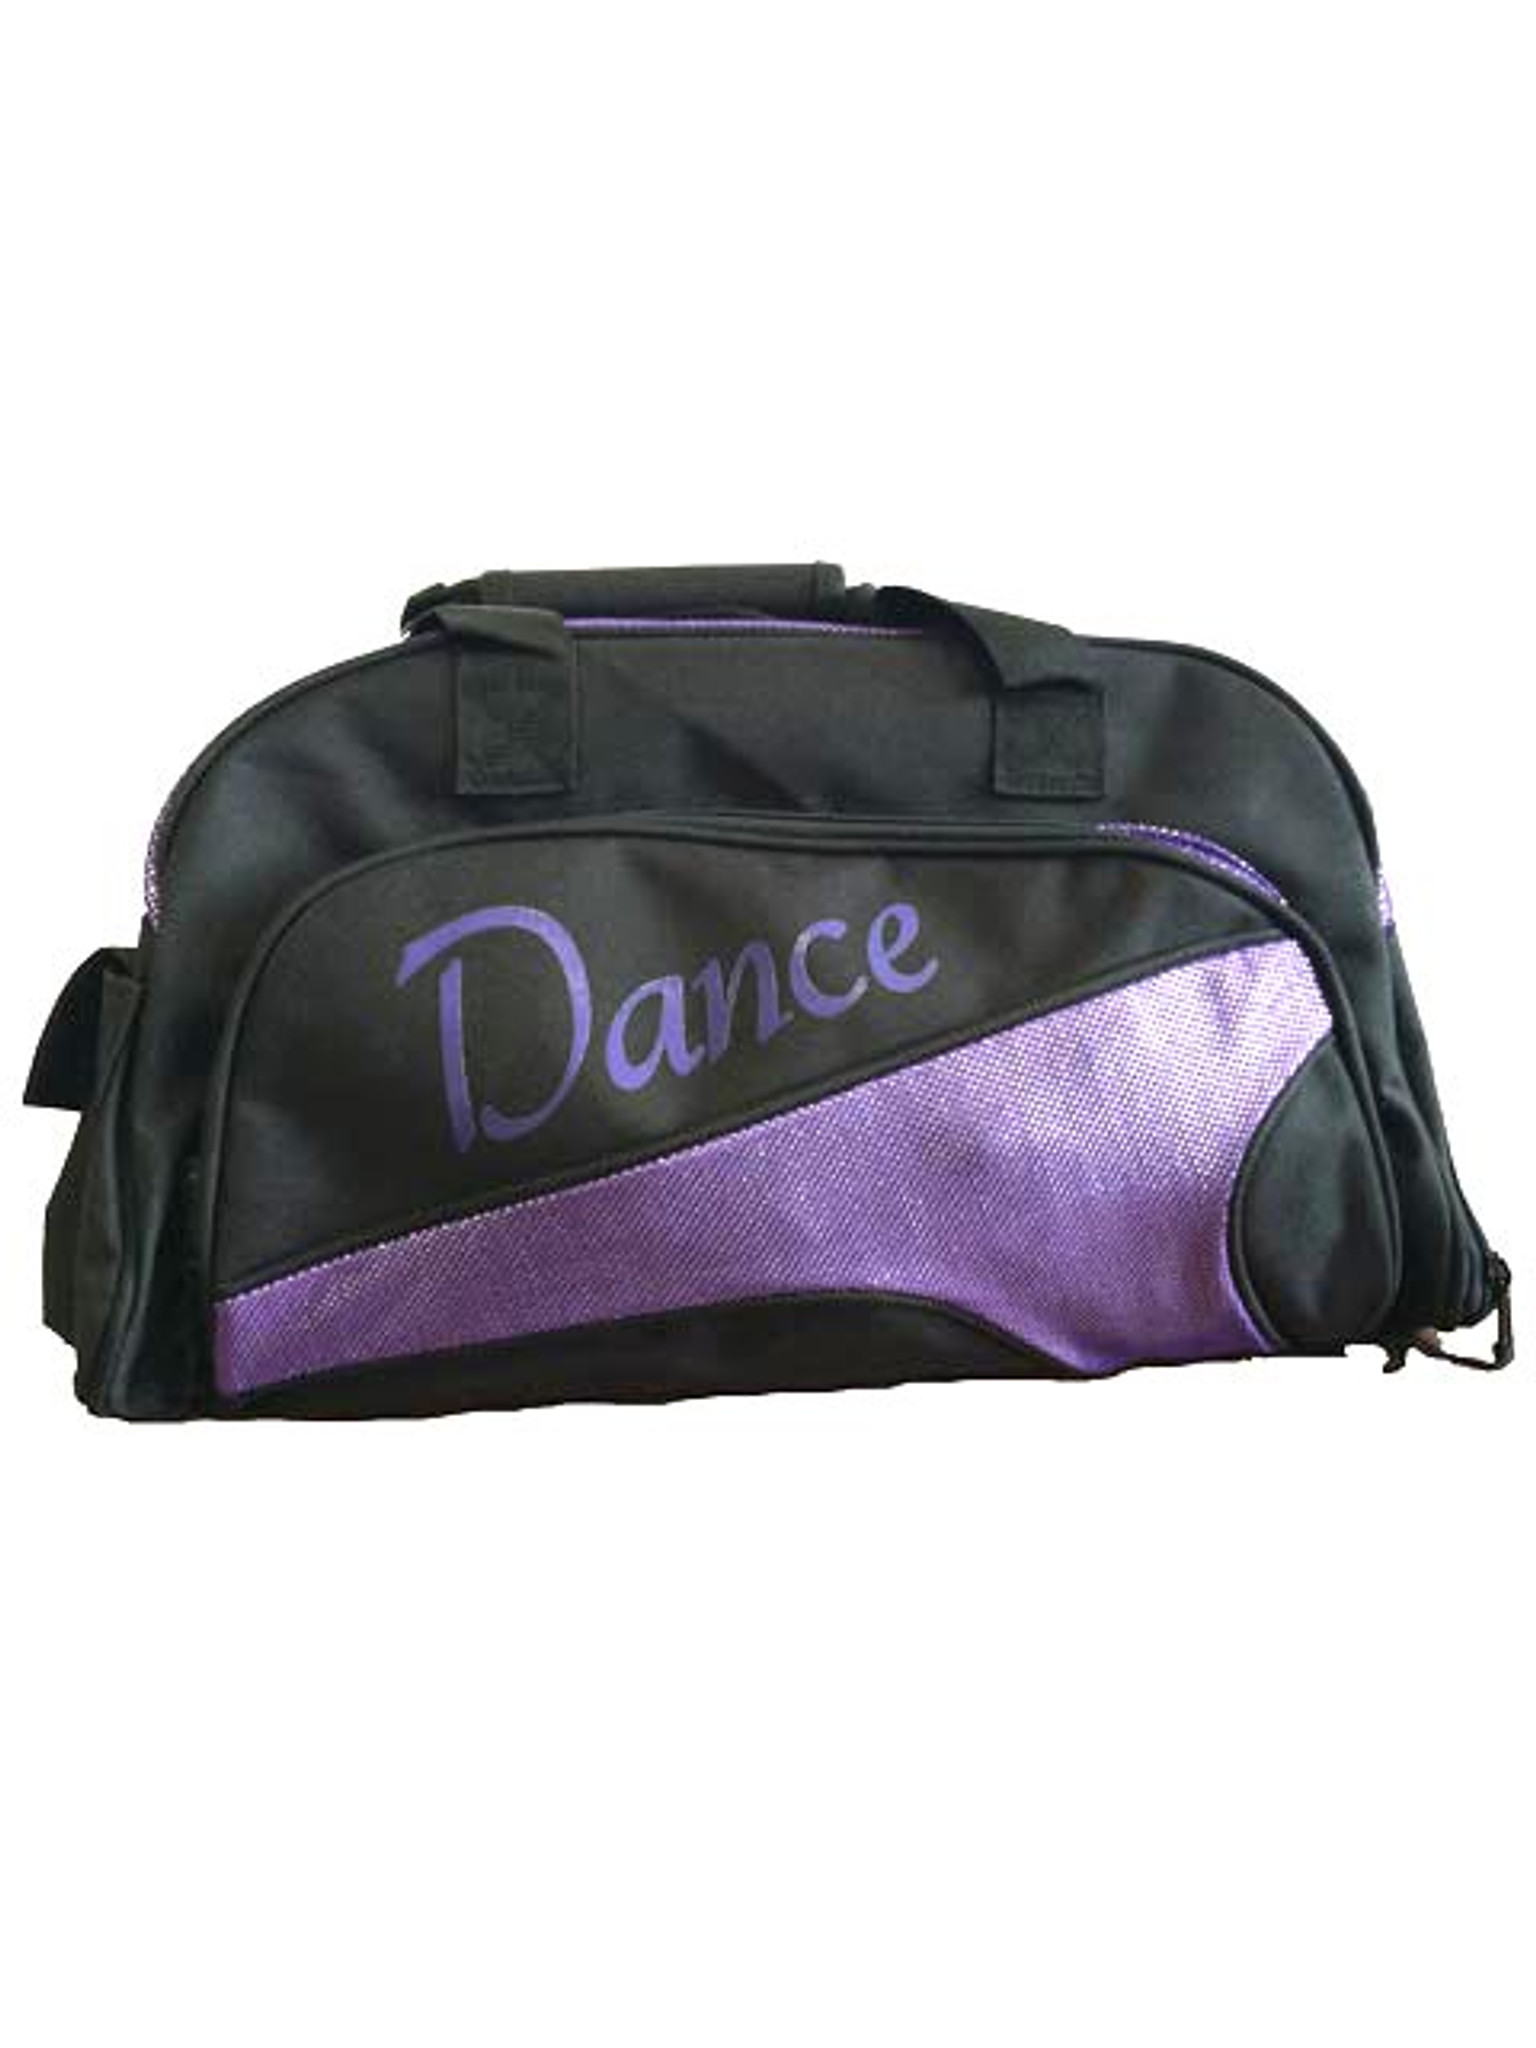 Studio 7 Dancewear Mini Duffel Dance Bag Lilac